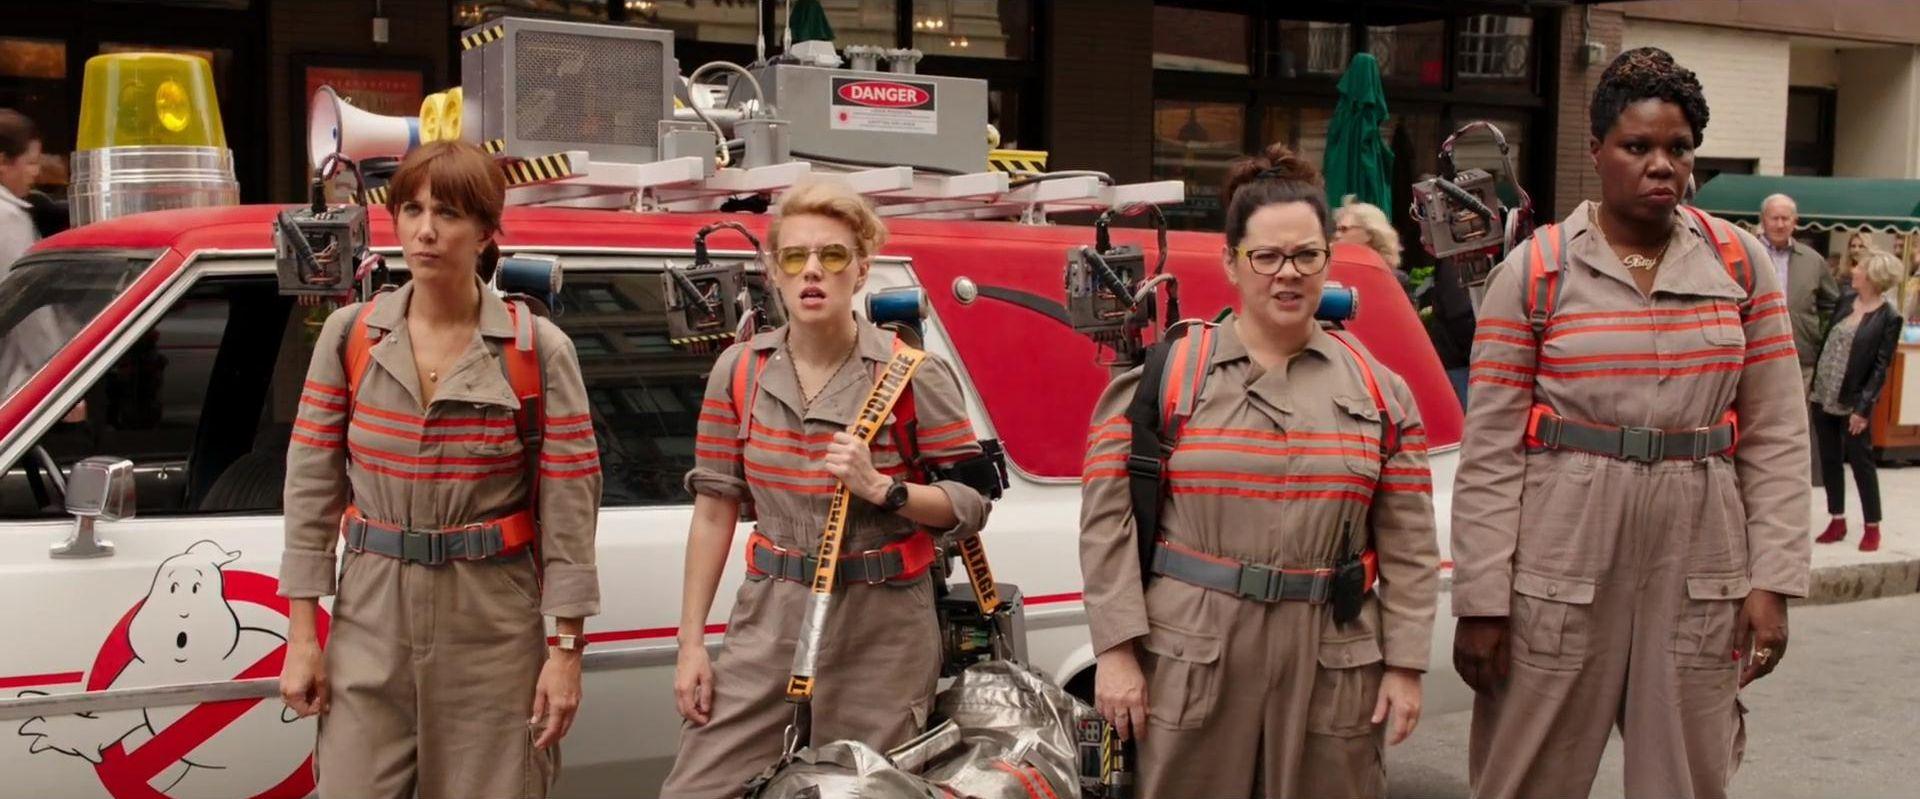 VIDEO: Pjesma Elle King i ostale najave za film 'Ghostbusters'